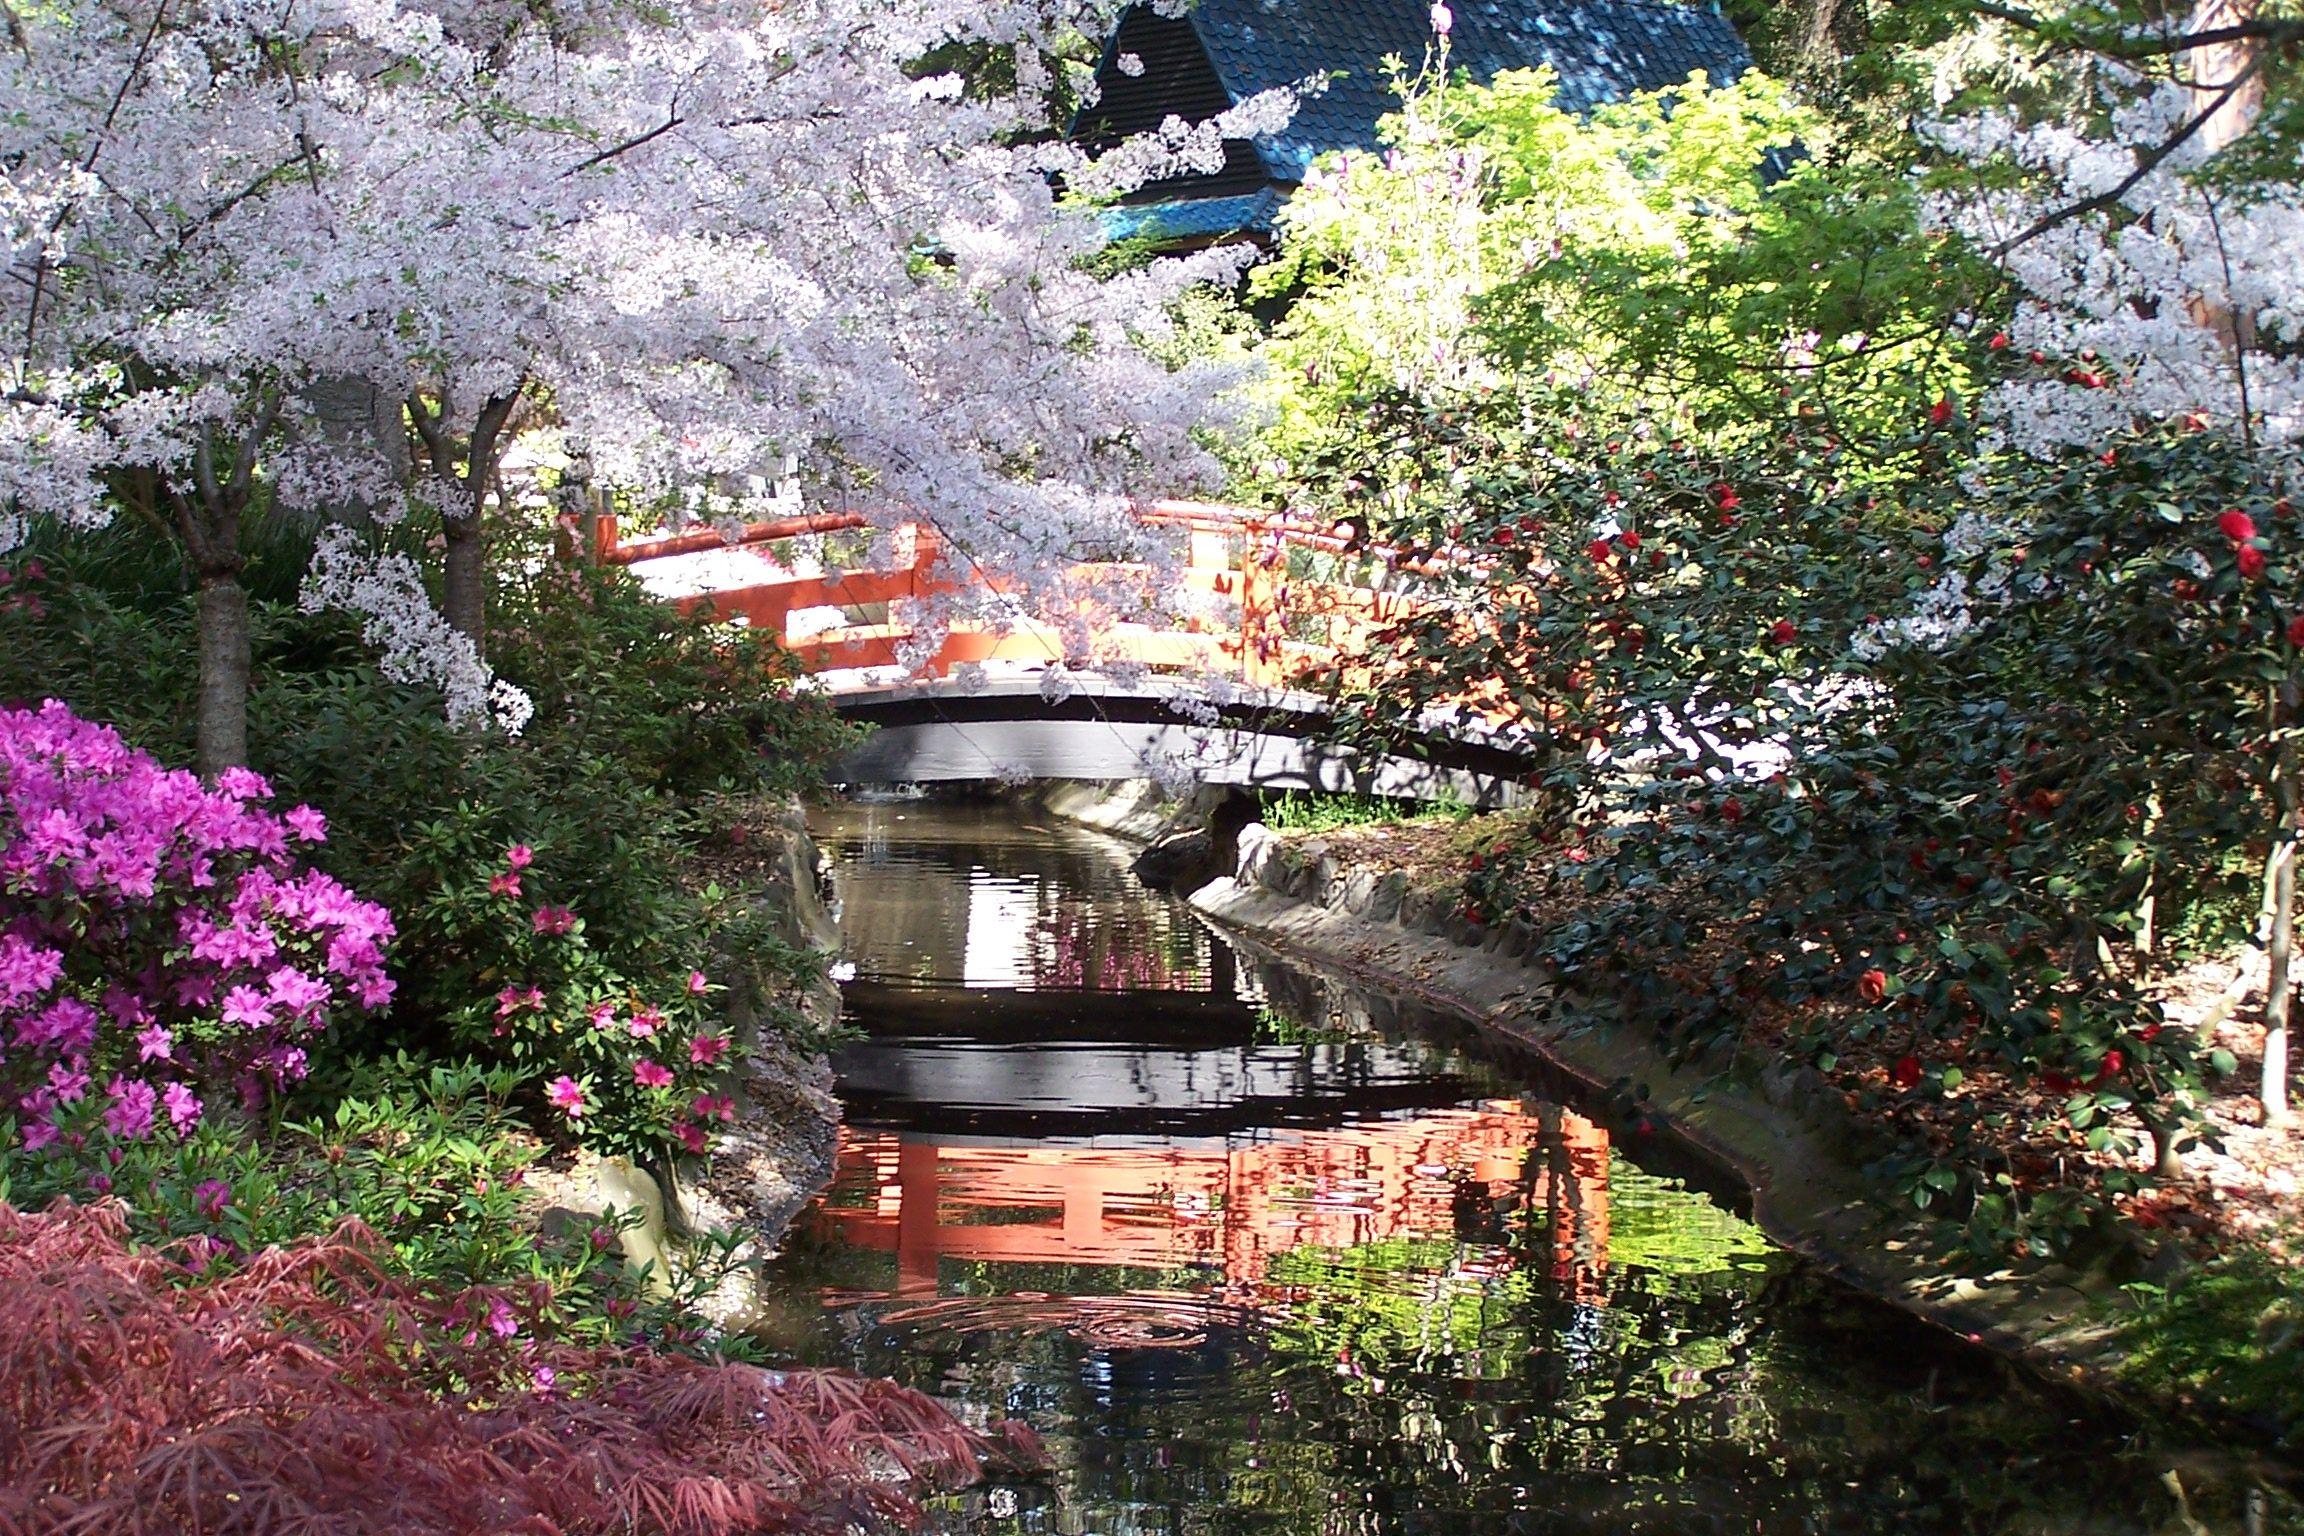 Descanso Gardens in La Cañada Flintridge, CA absolutely